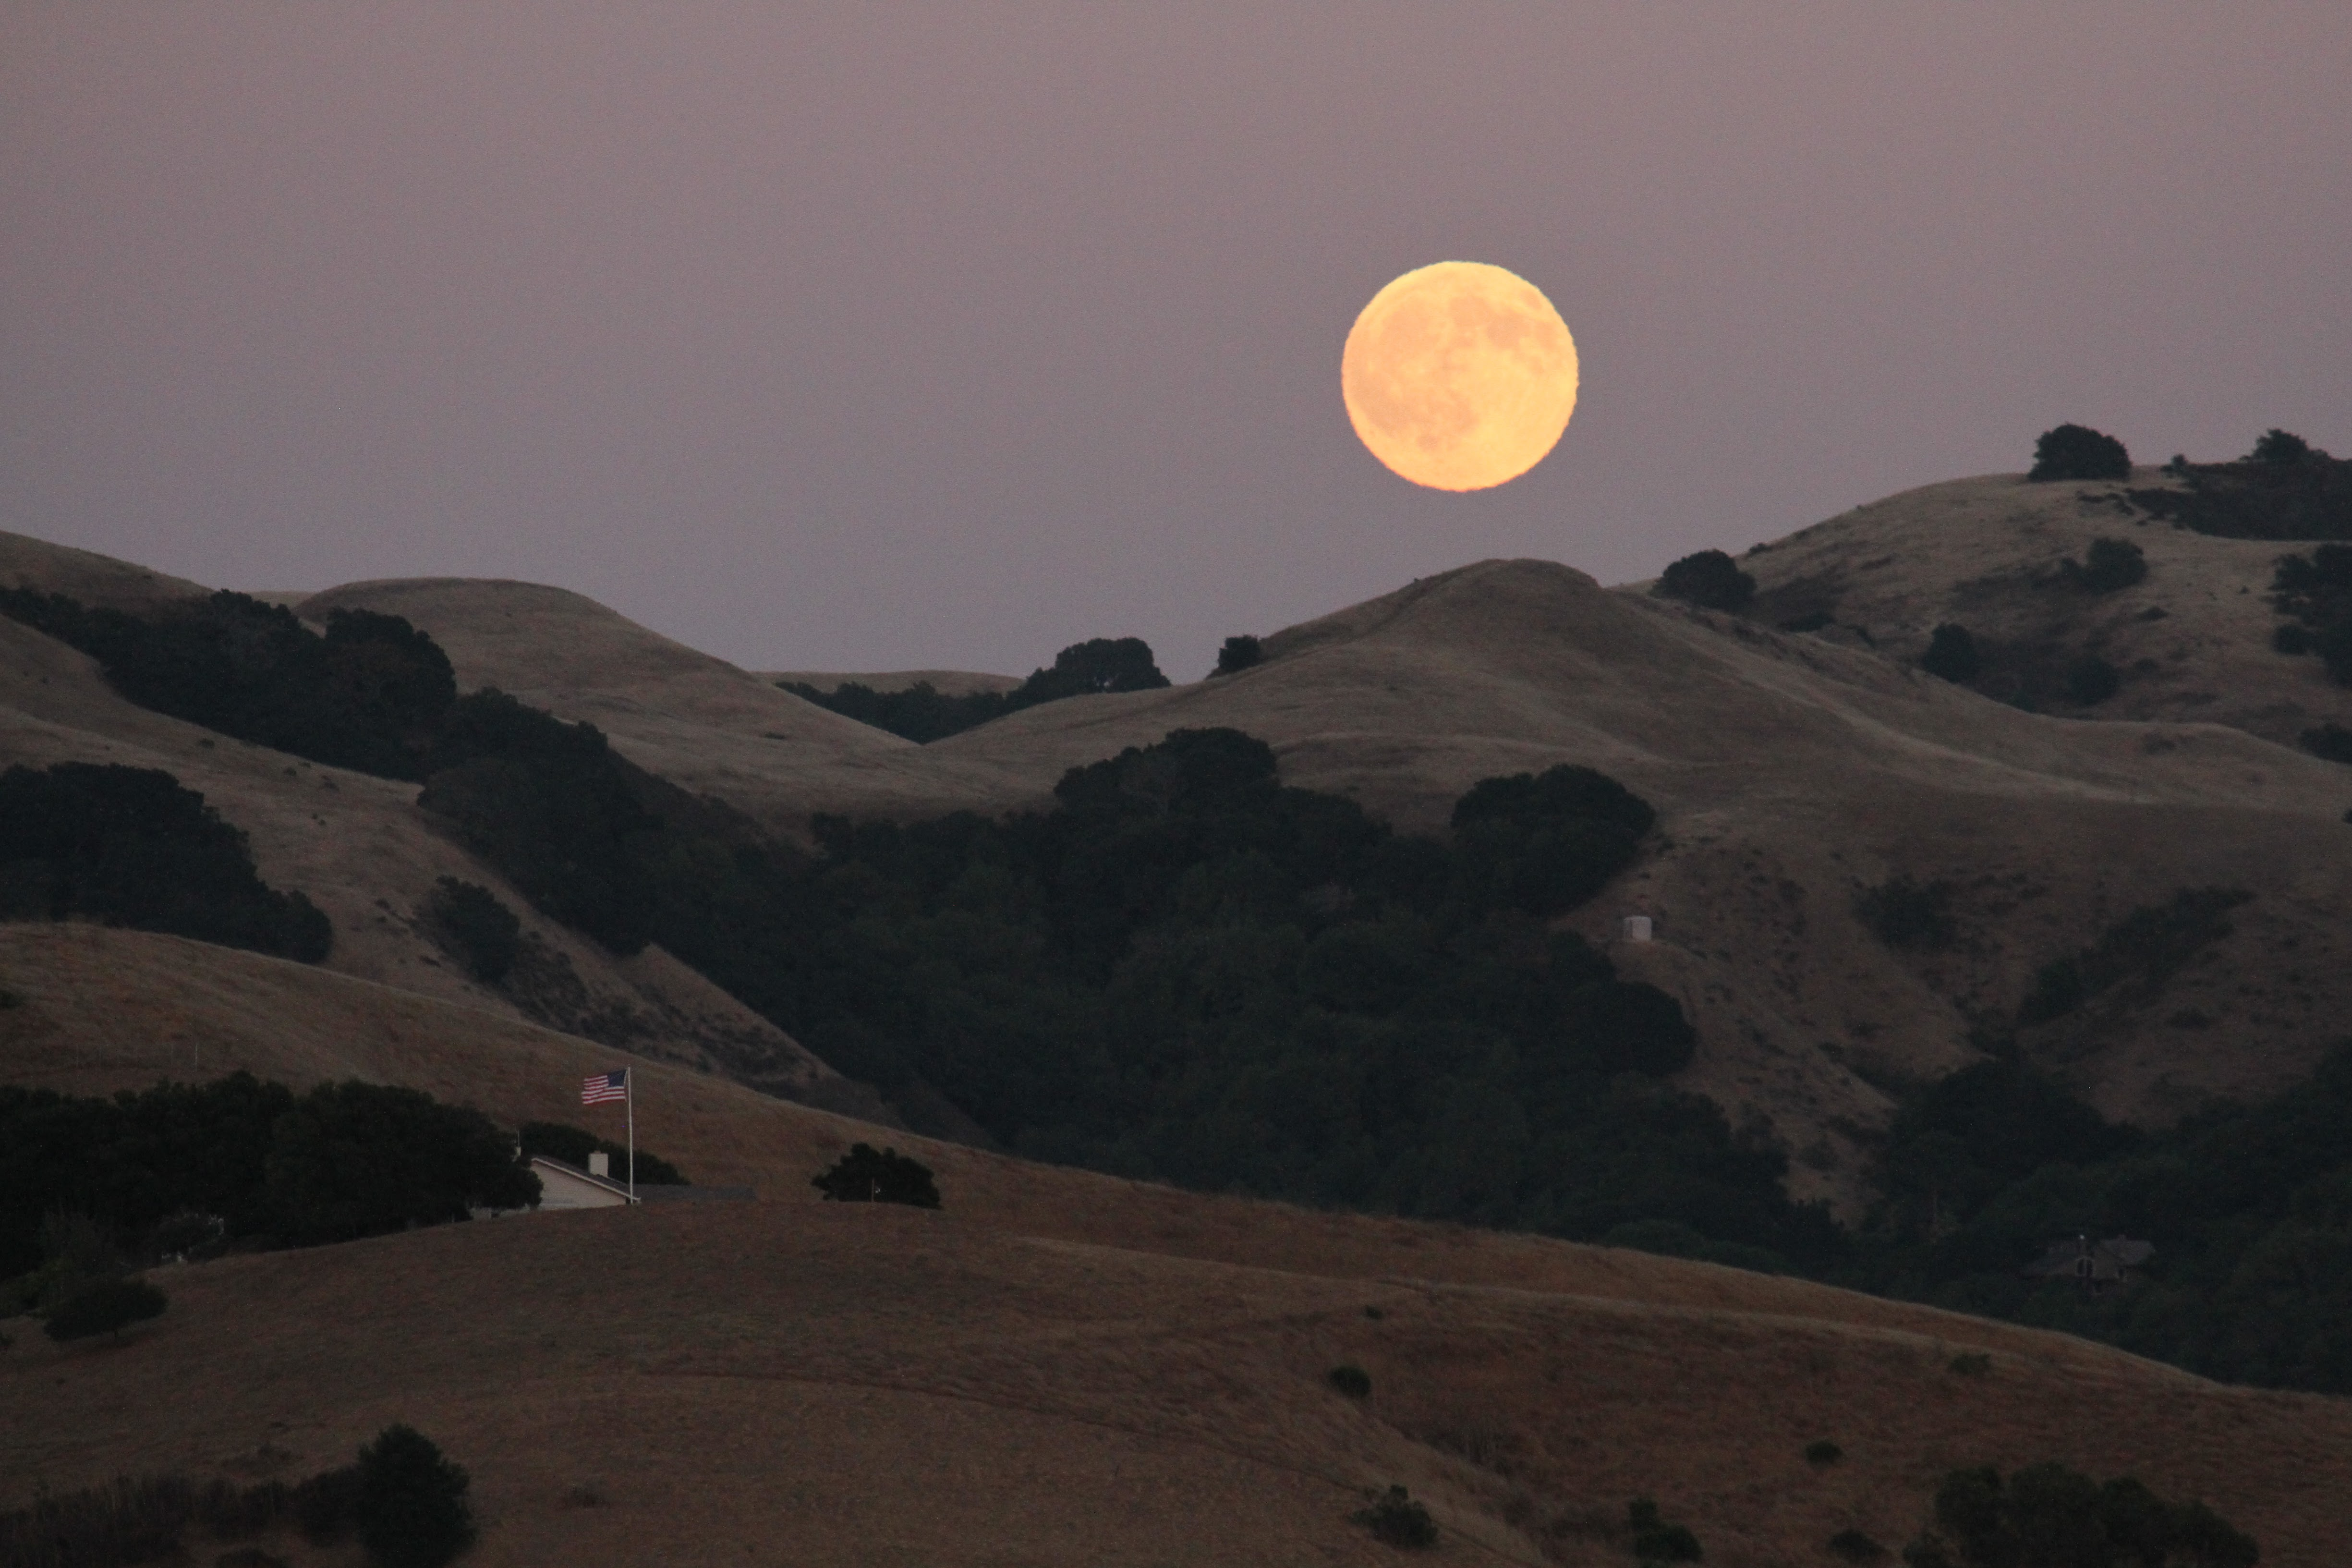 red moon desert xp - photo #16